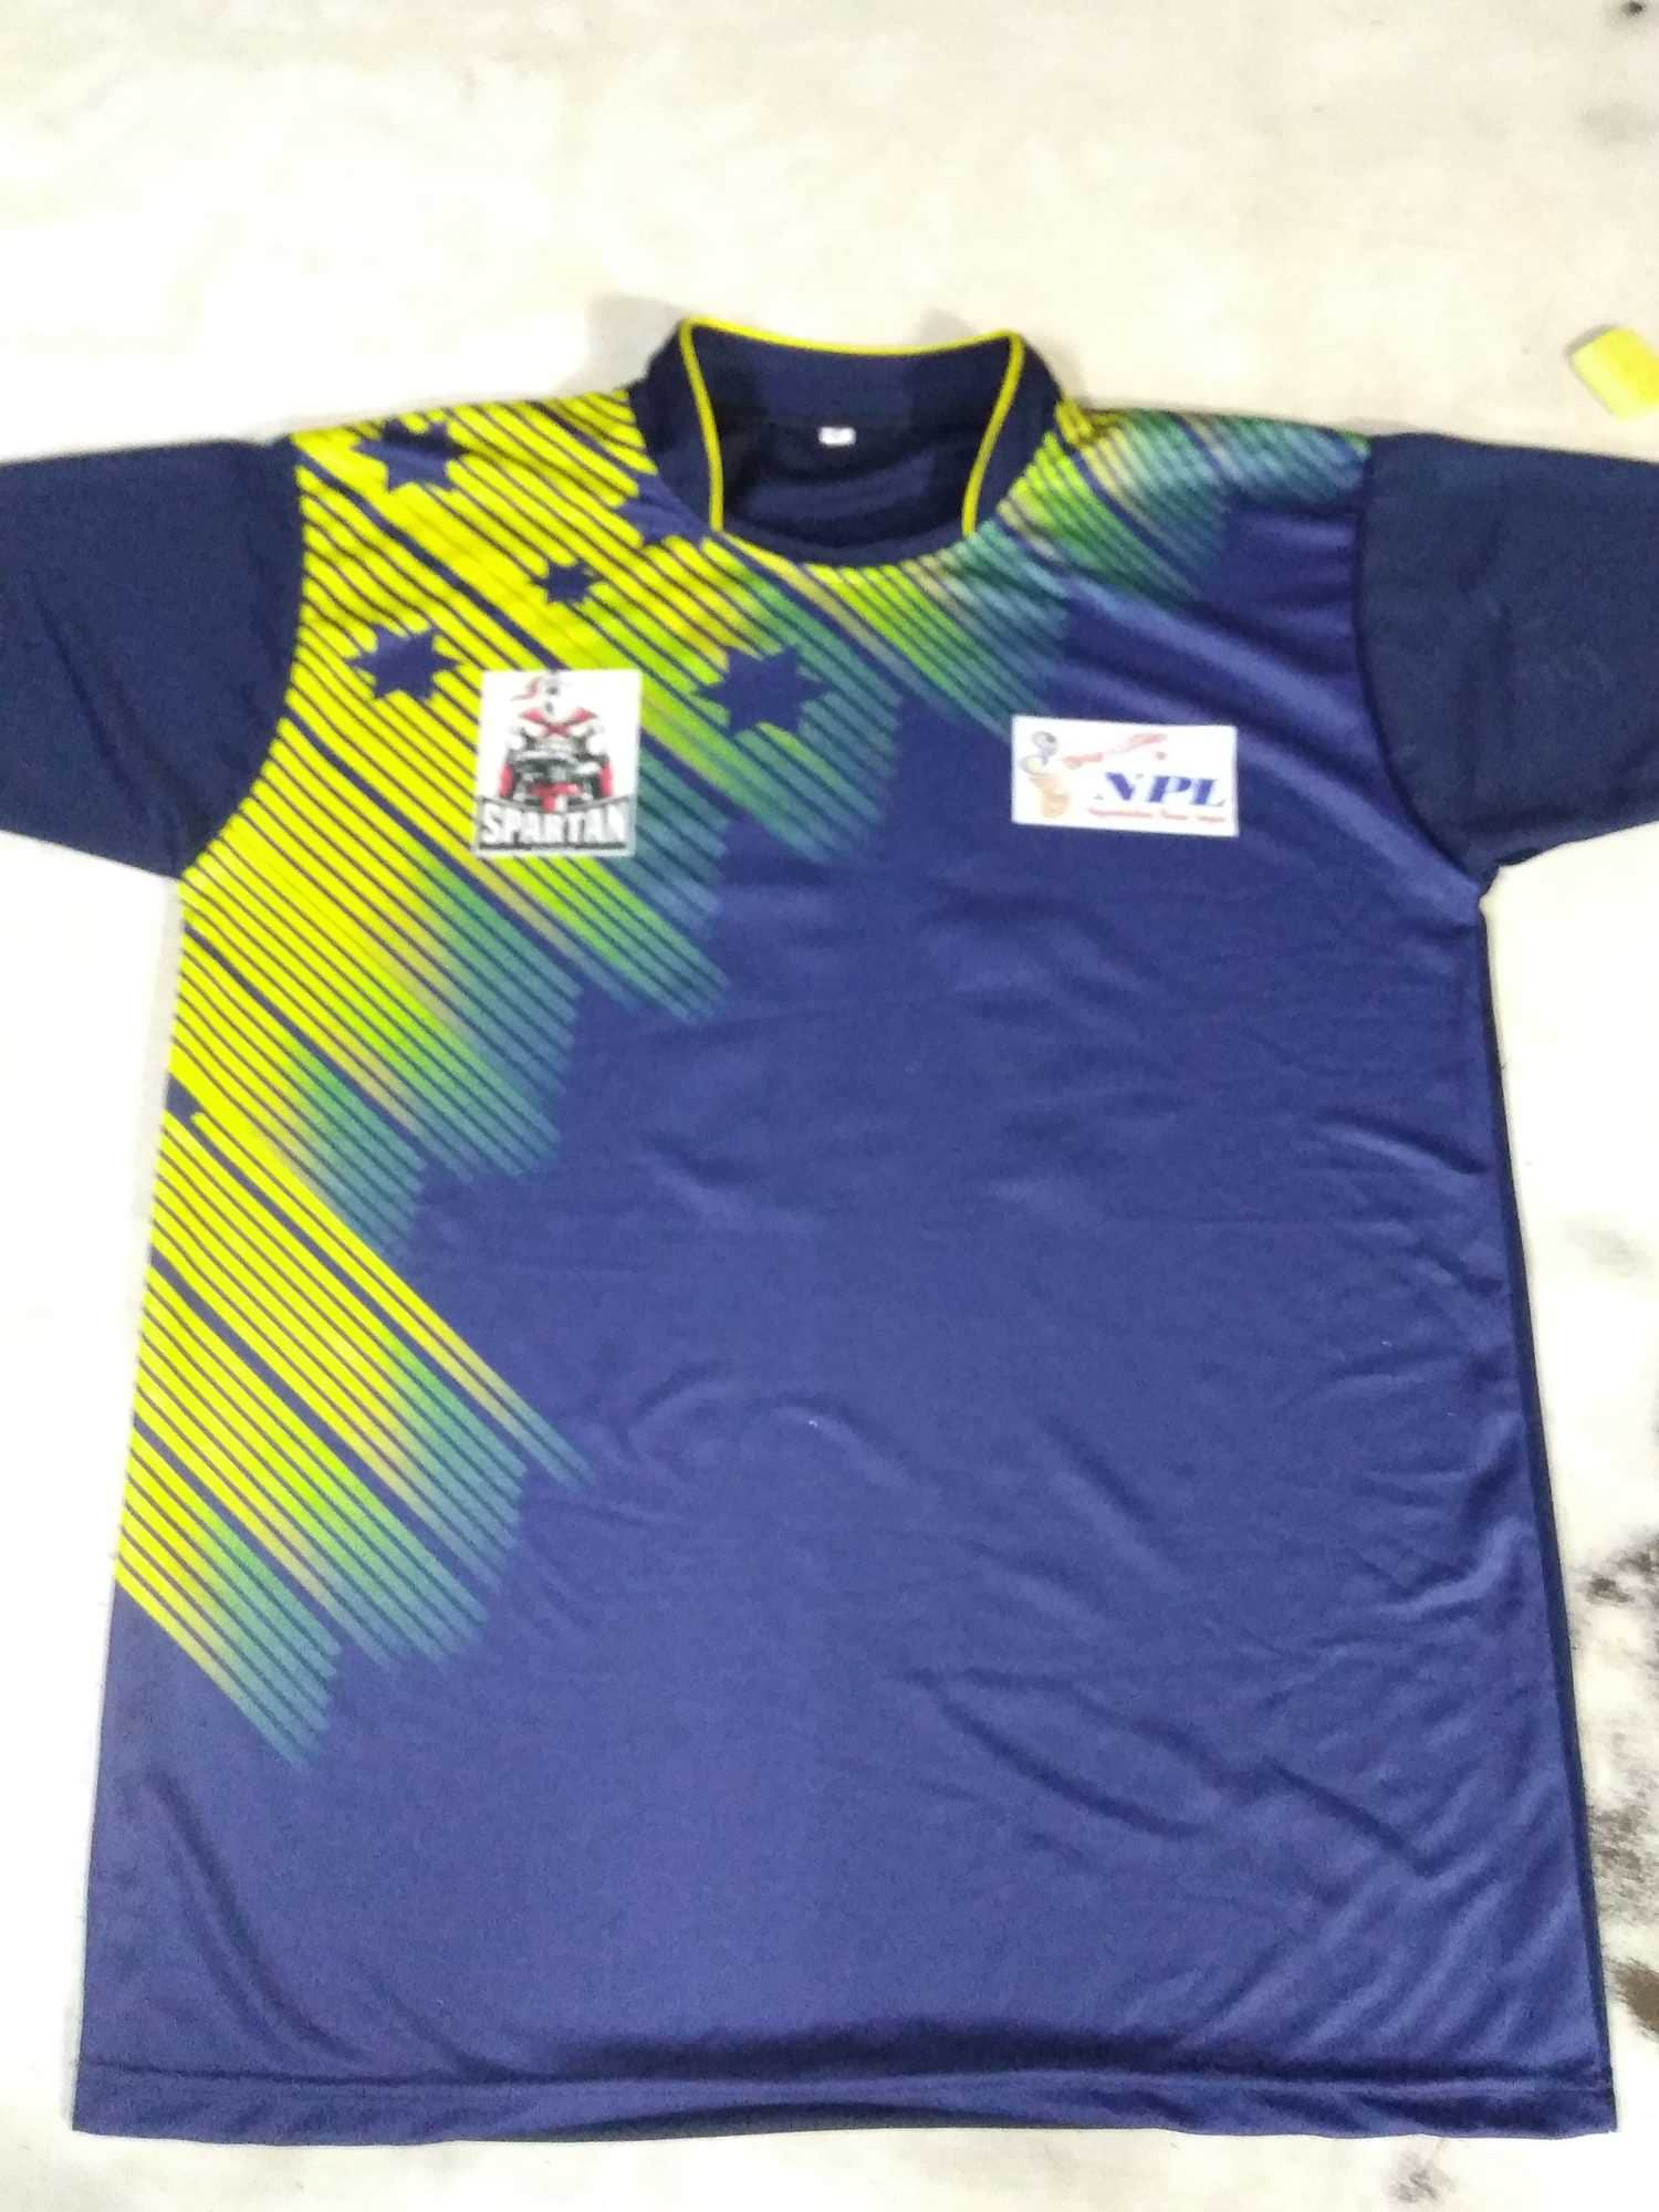 08d668c8dbc Top 100 Gents Readymade Garment Retailers in T Nagar - Best ...